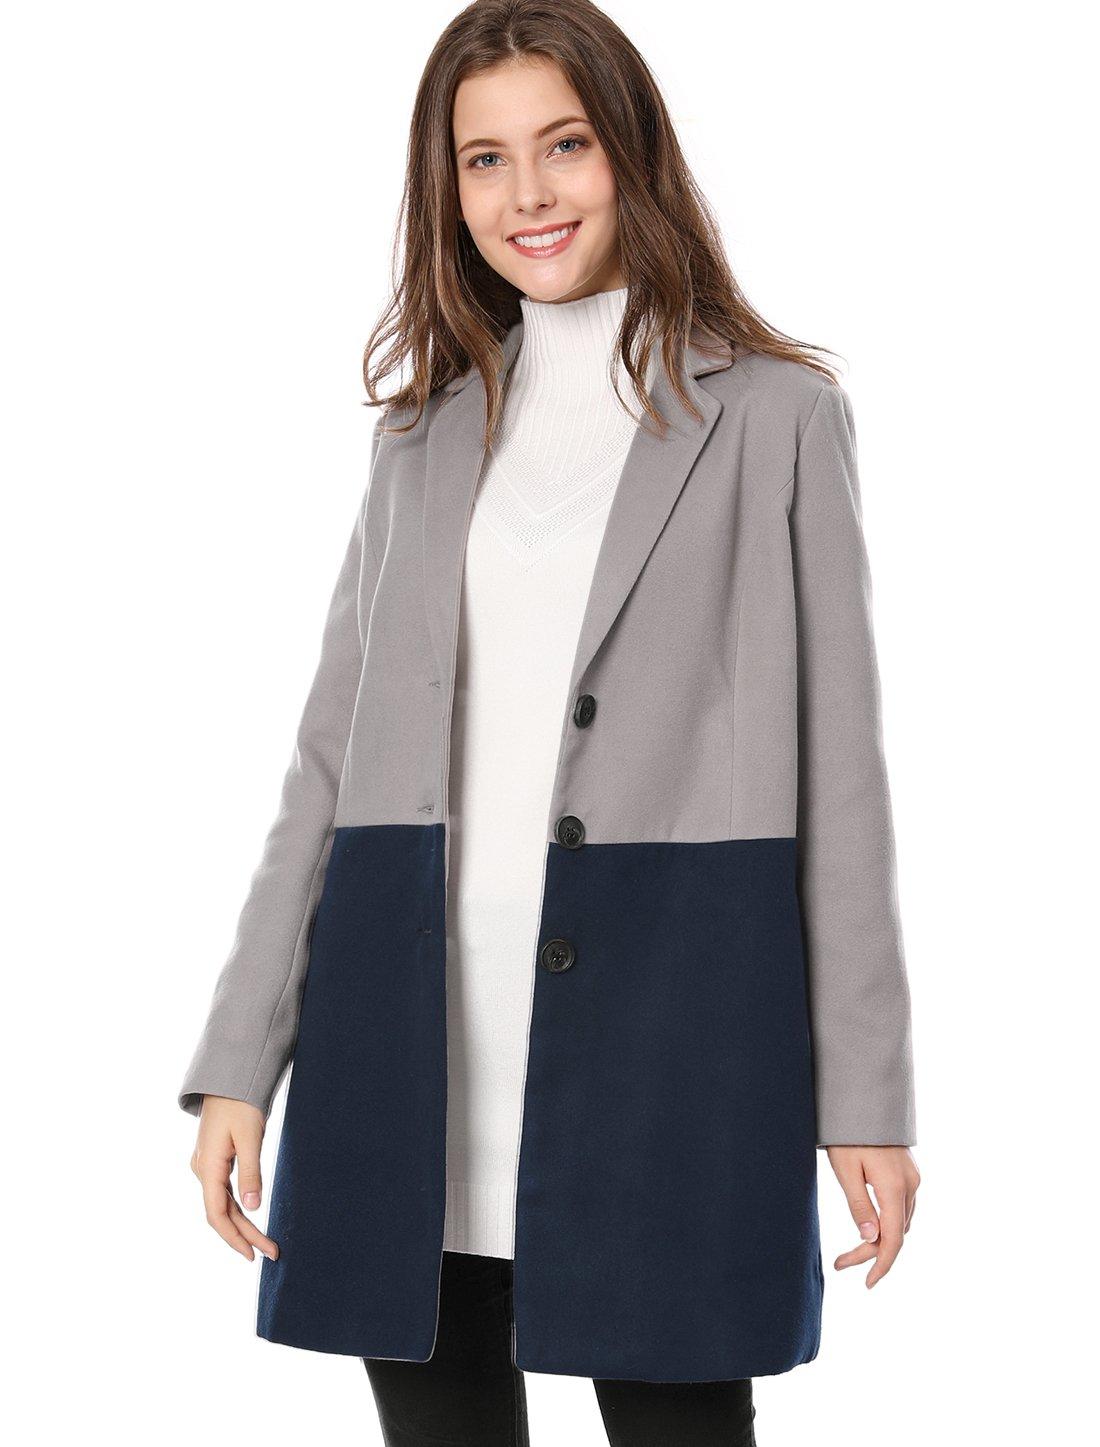 Allegra K Women's Notched Lapel Single Breasted Color Block Coat Jacket L Grey